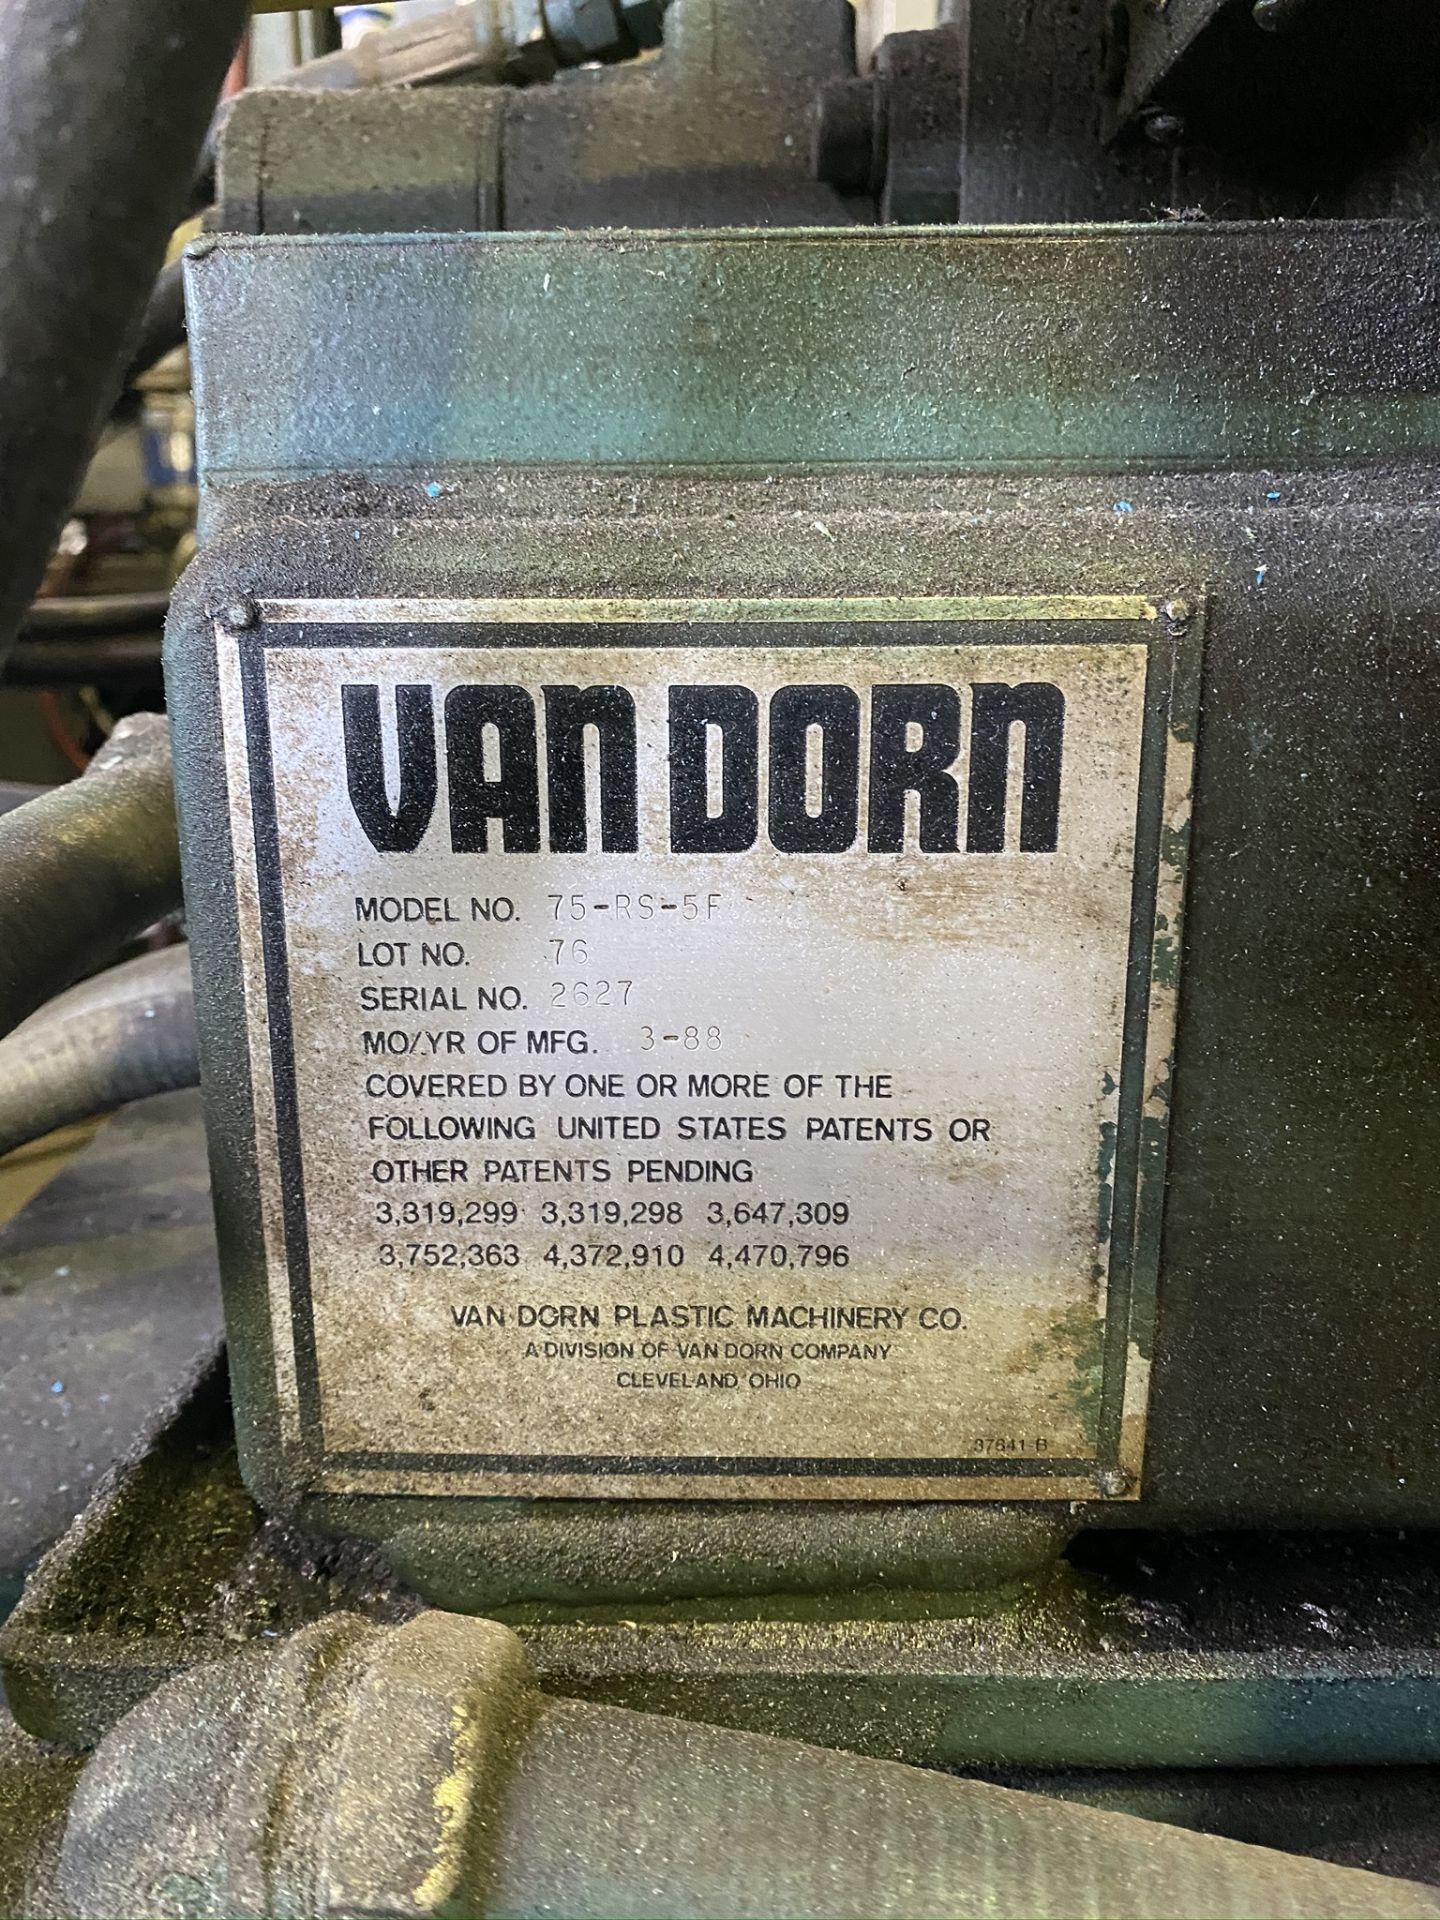 "Lot 12 - 1988 VAN DORN 75 TON, MODEL 75-RS-7T, PATHFINDER 4500 CONTROL, 25.4 OZ SHOT SIZE, 32"" X 32"" PLATENS"